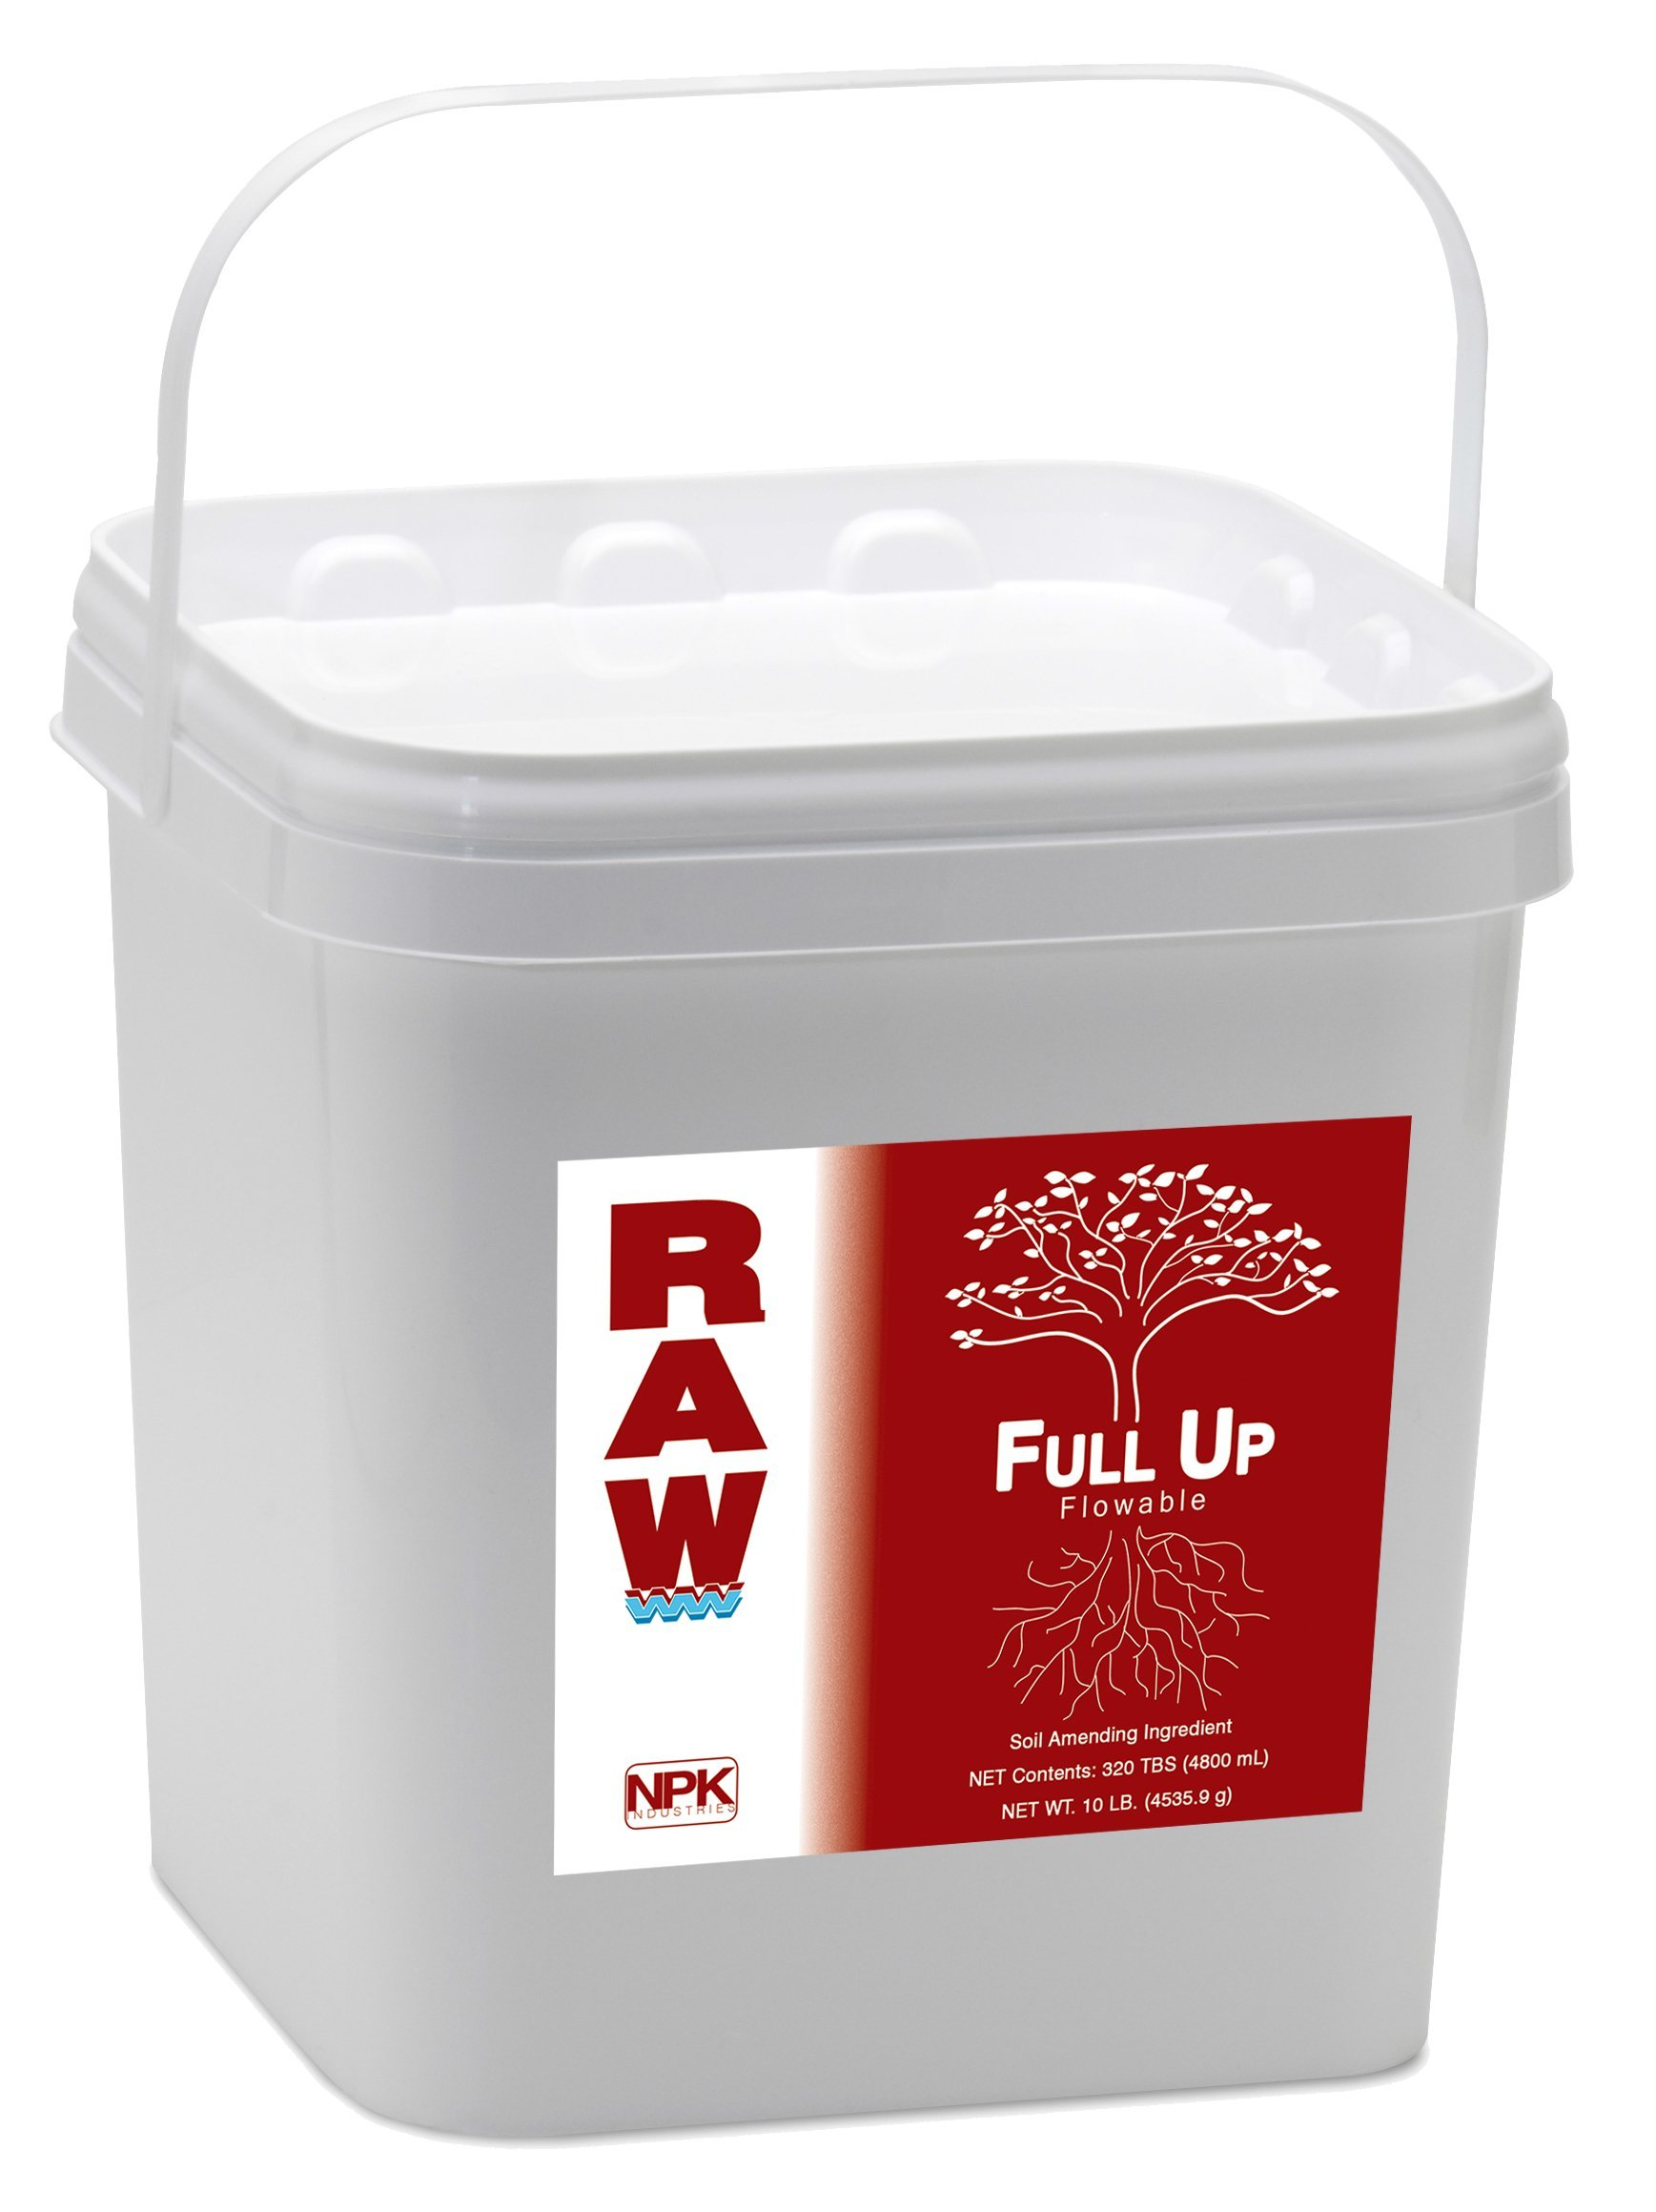 RAW Full Up 10 lb